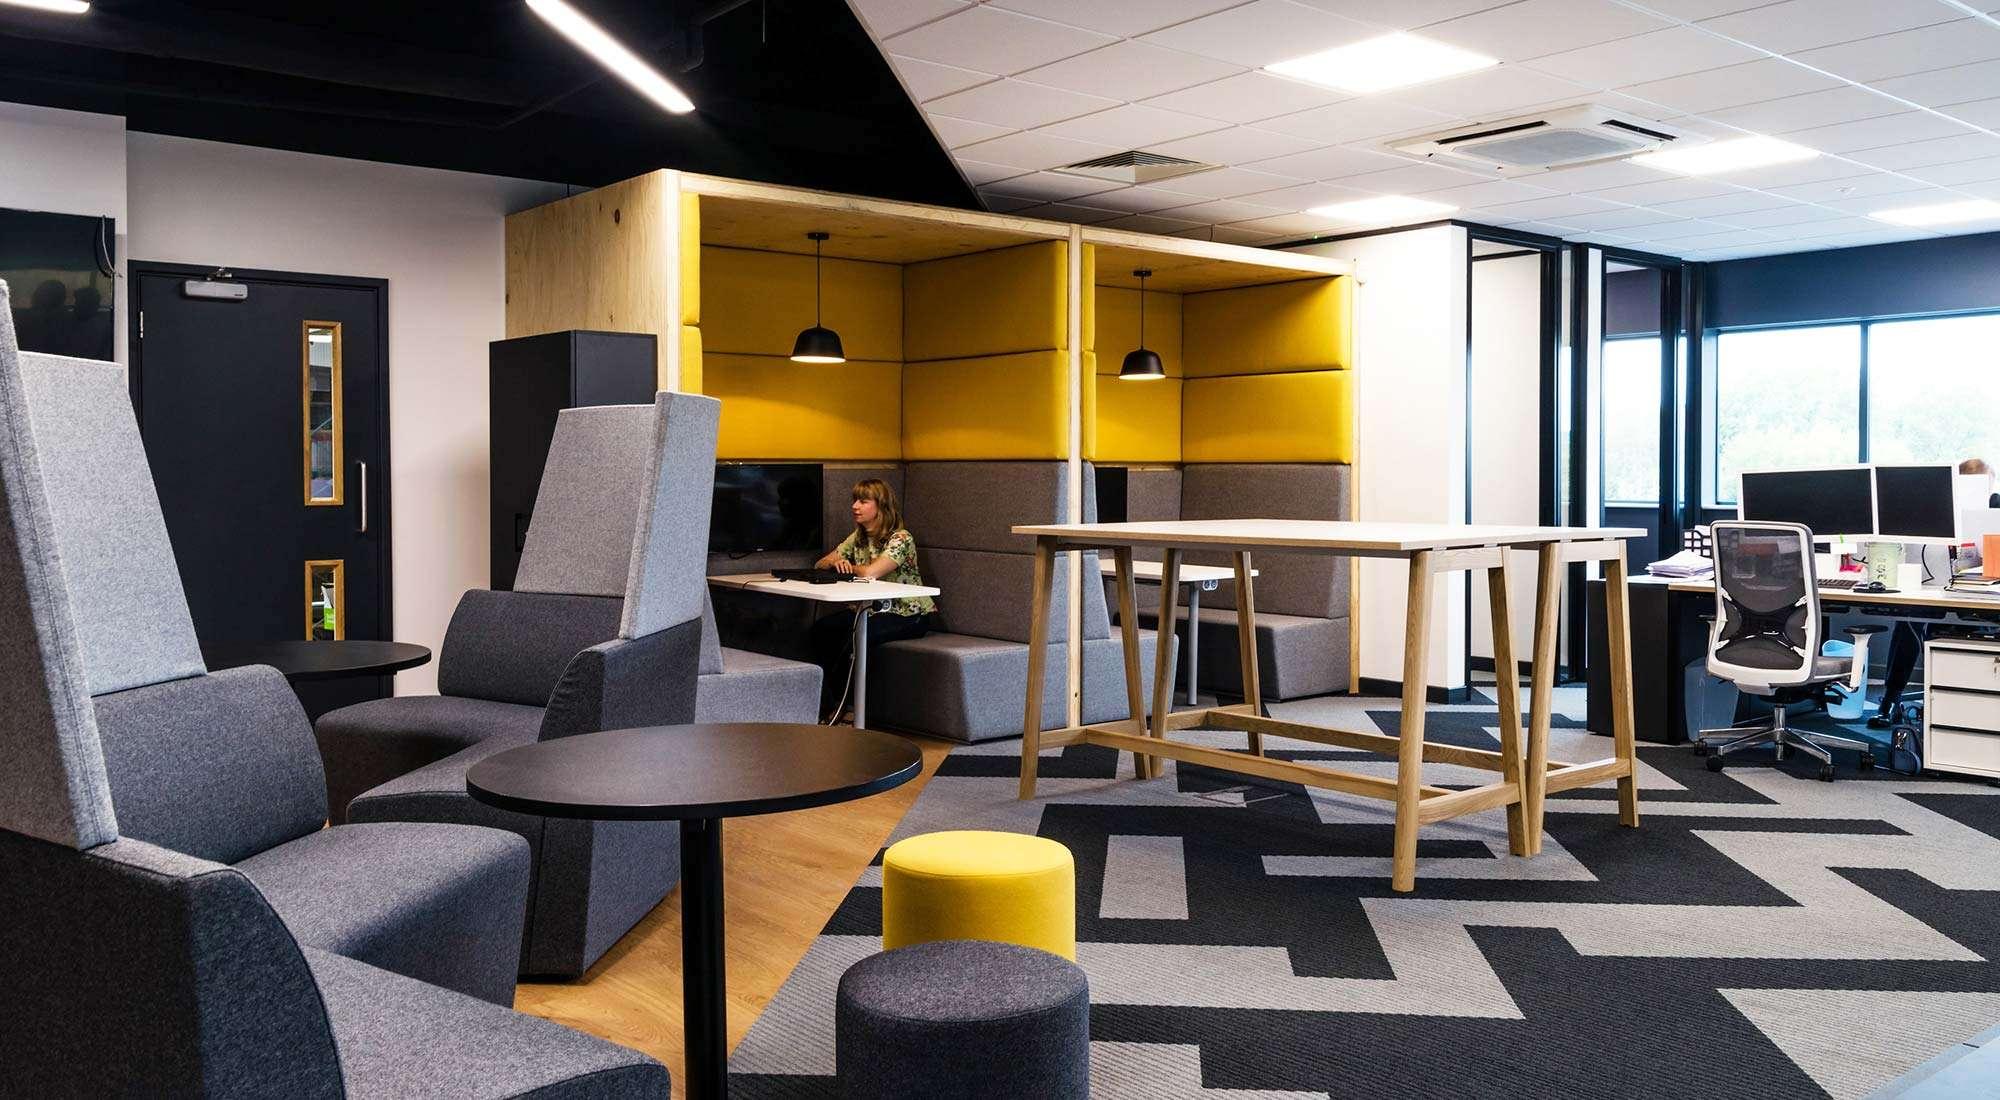 Desso Tarkett Carpet Orangebox Booths Bespoke Interior Office Design